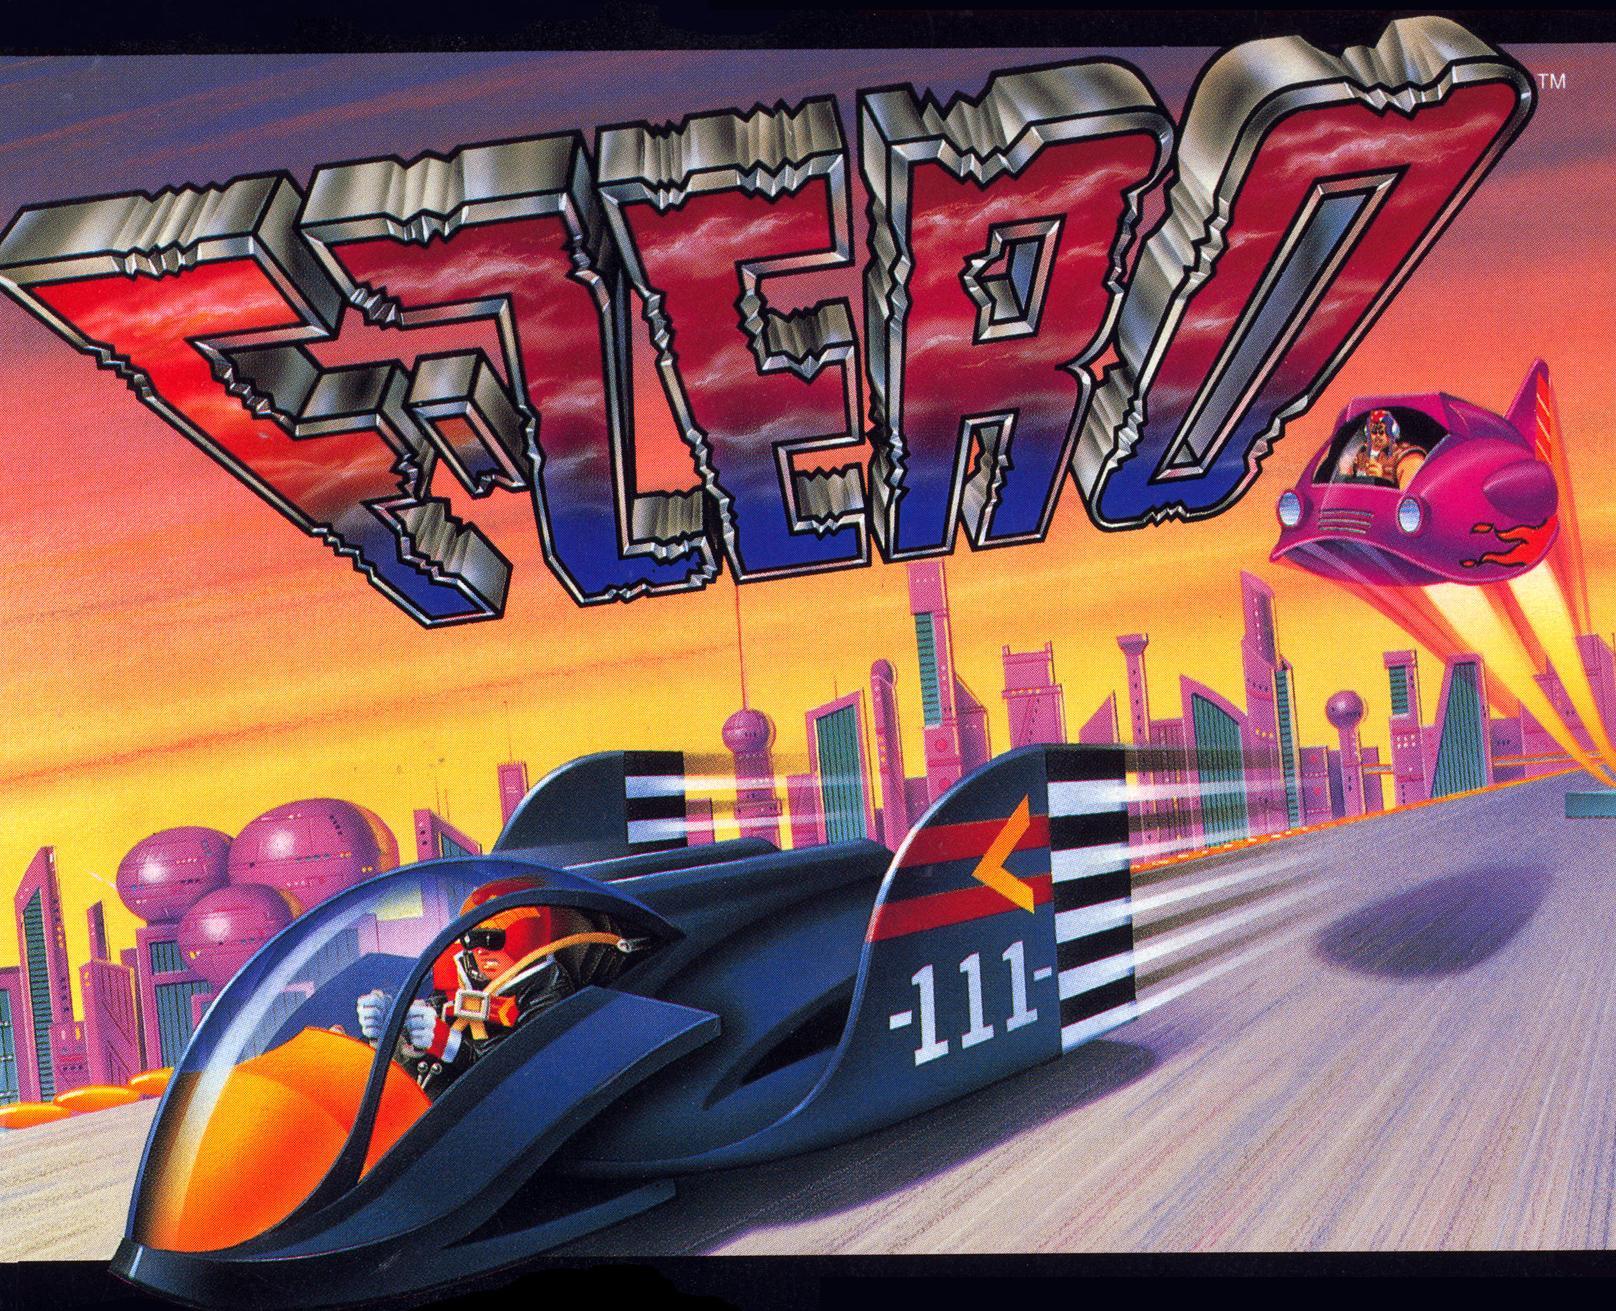 Nintendo F-Zero